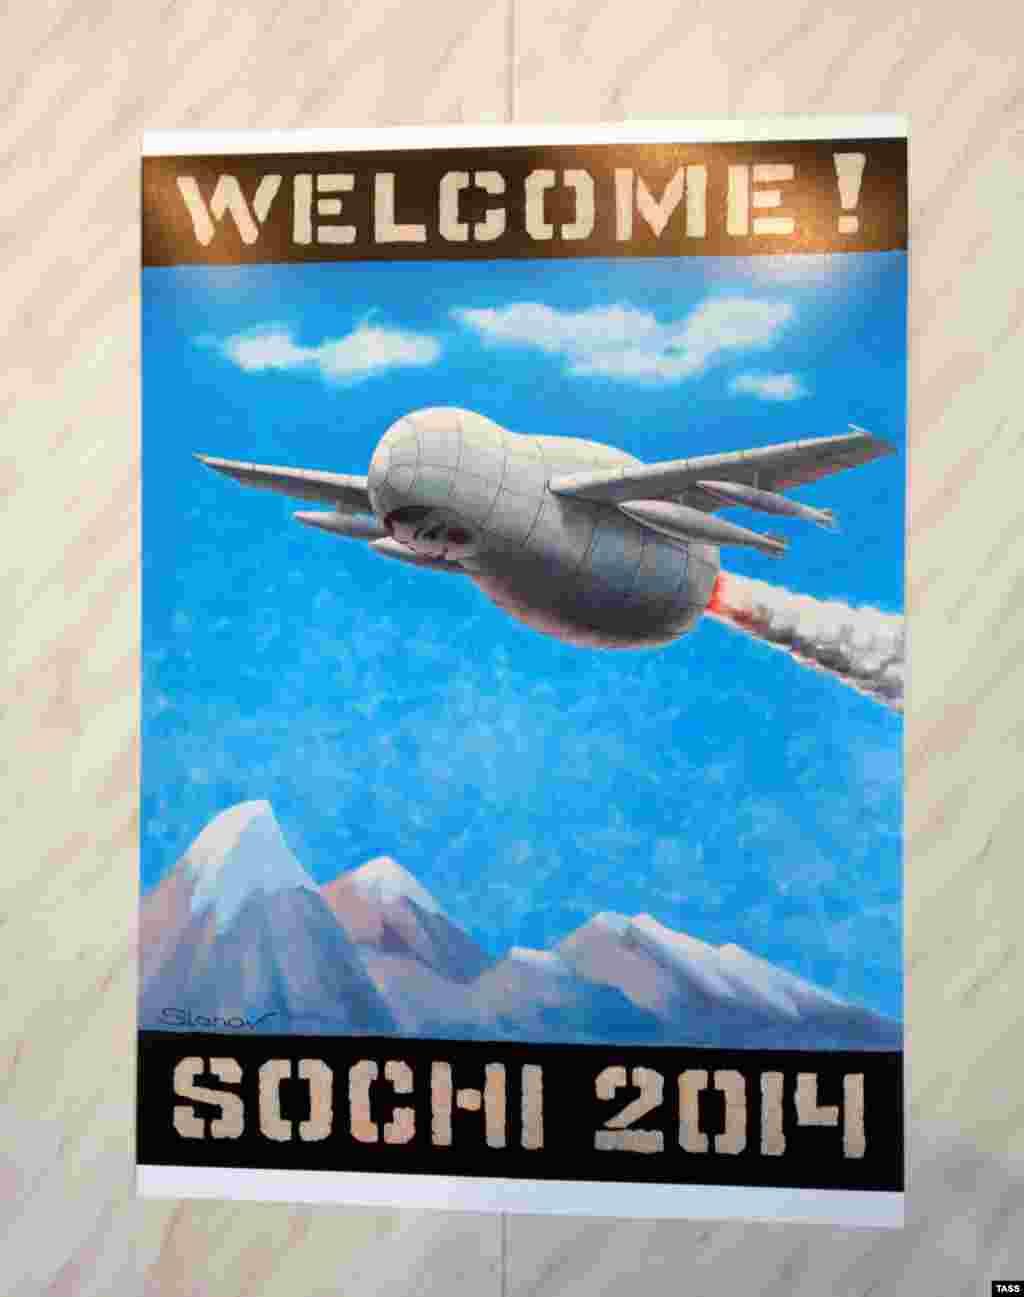 An aircraft-shaped matryoshka doll flies over Slonov's imagined Russia.